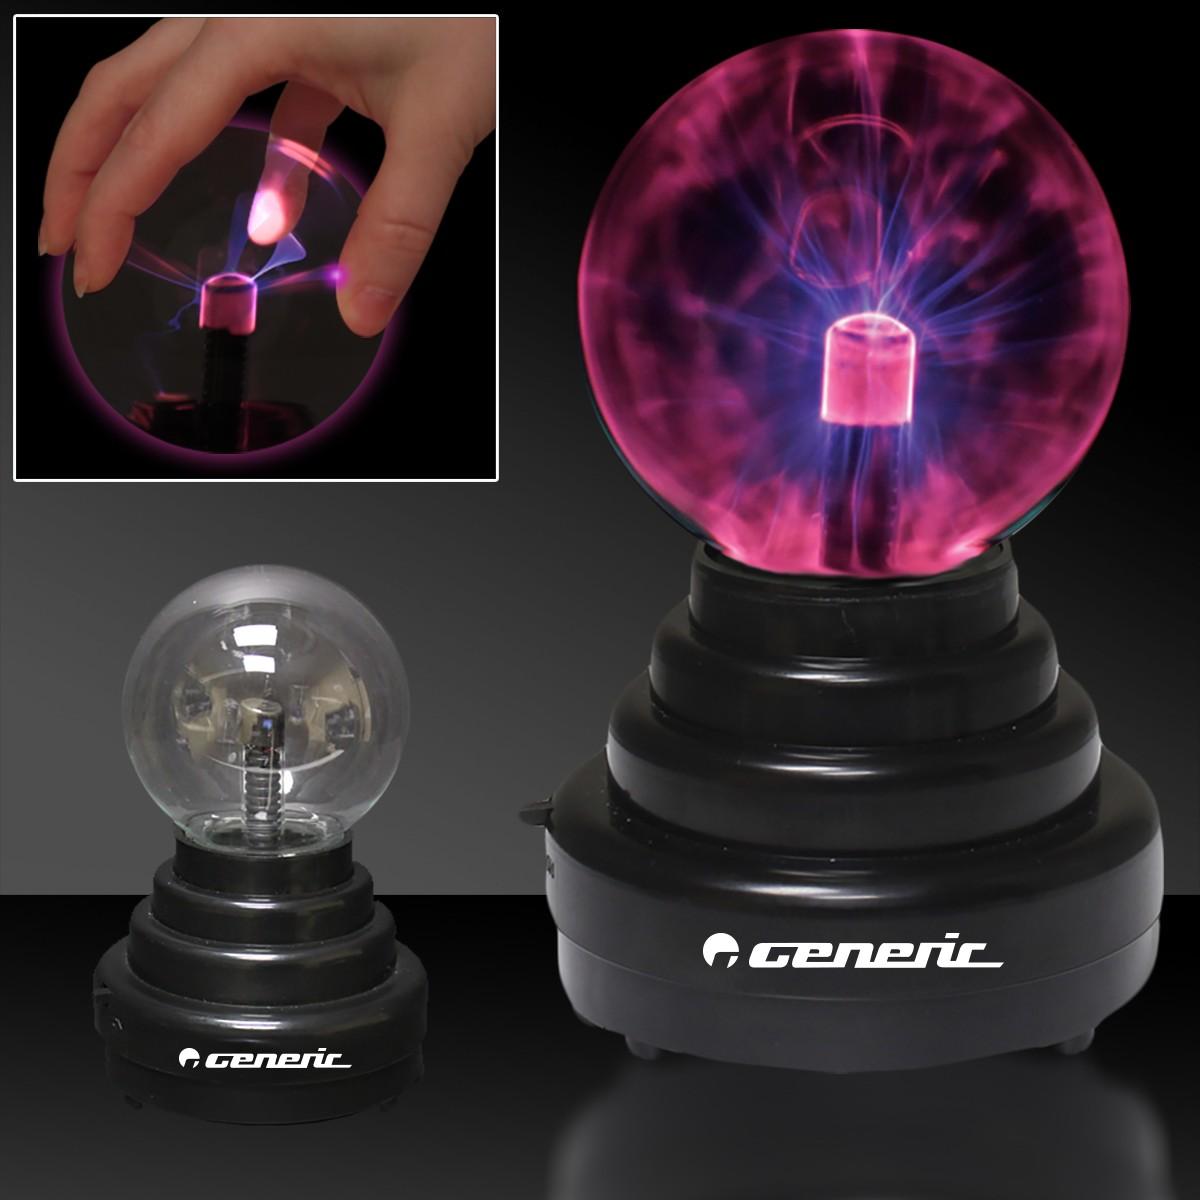 6 INCH LASER BALL LAMP